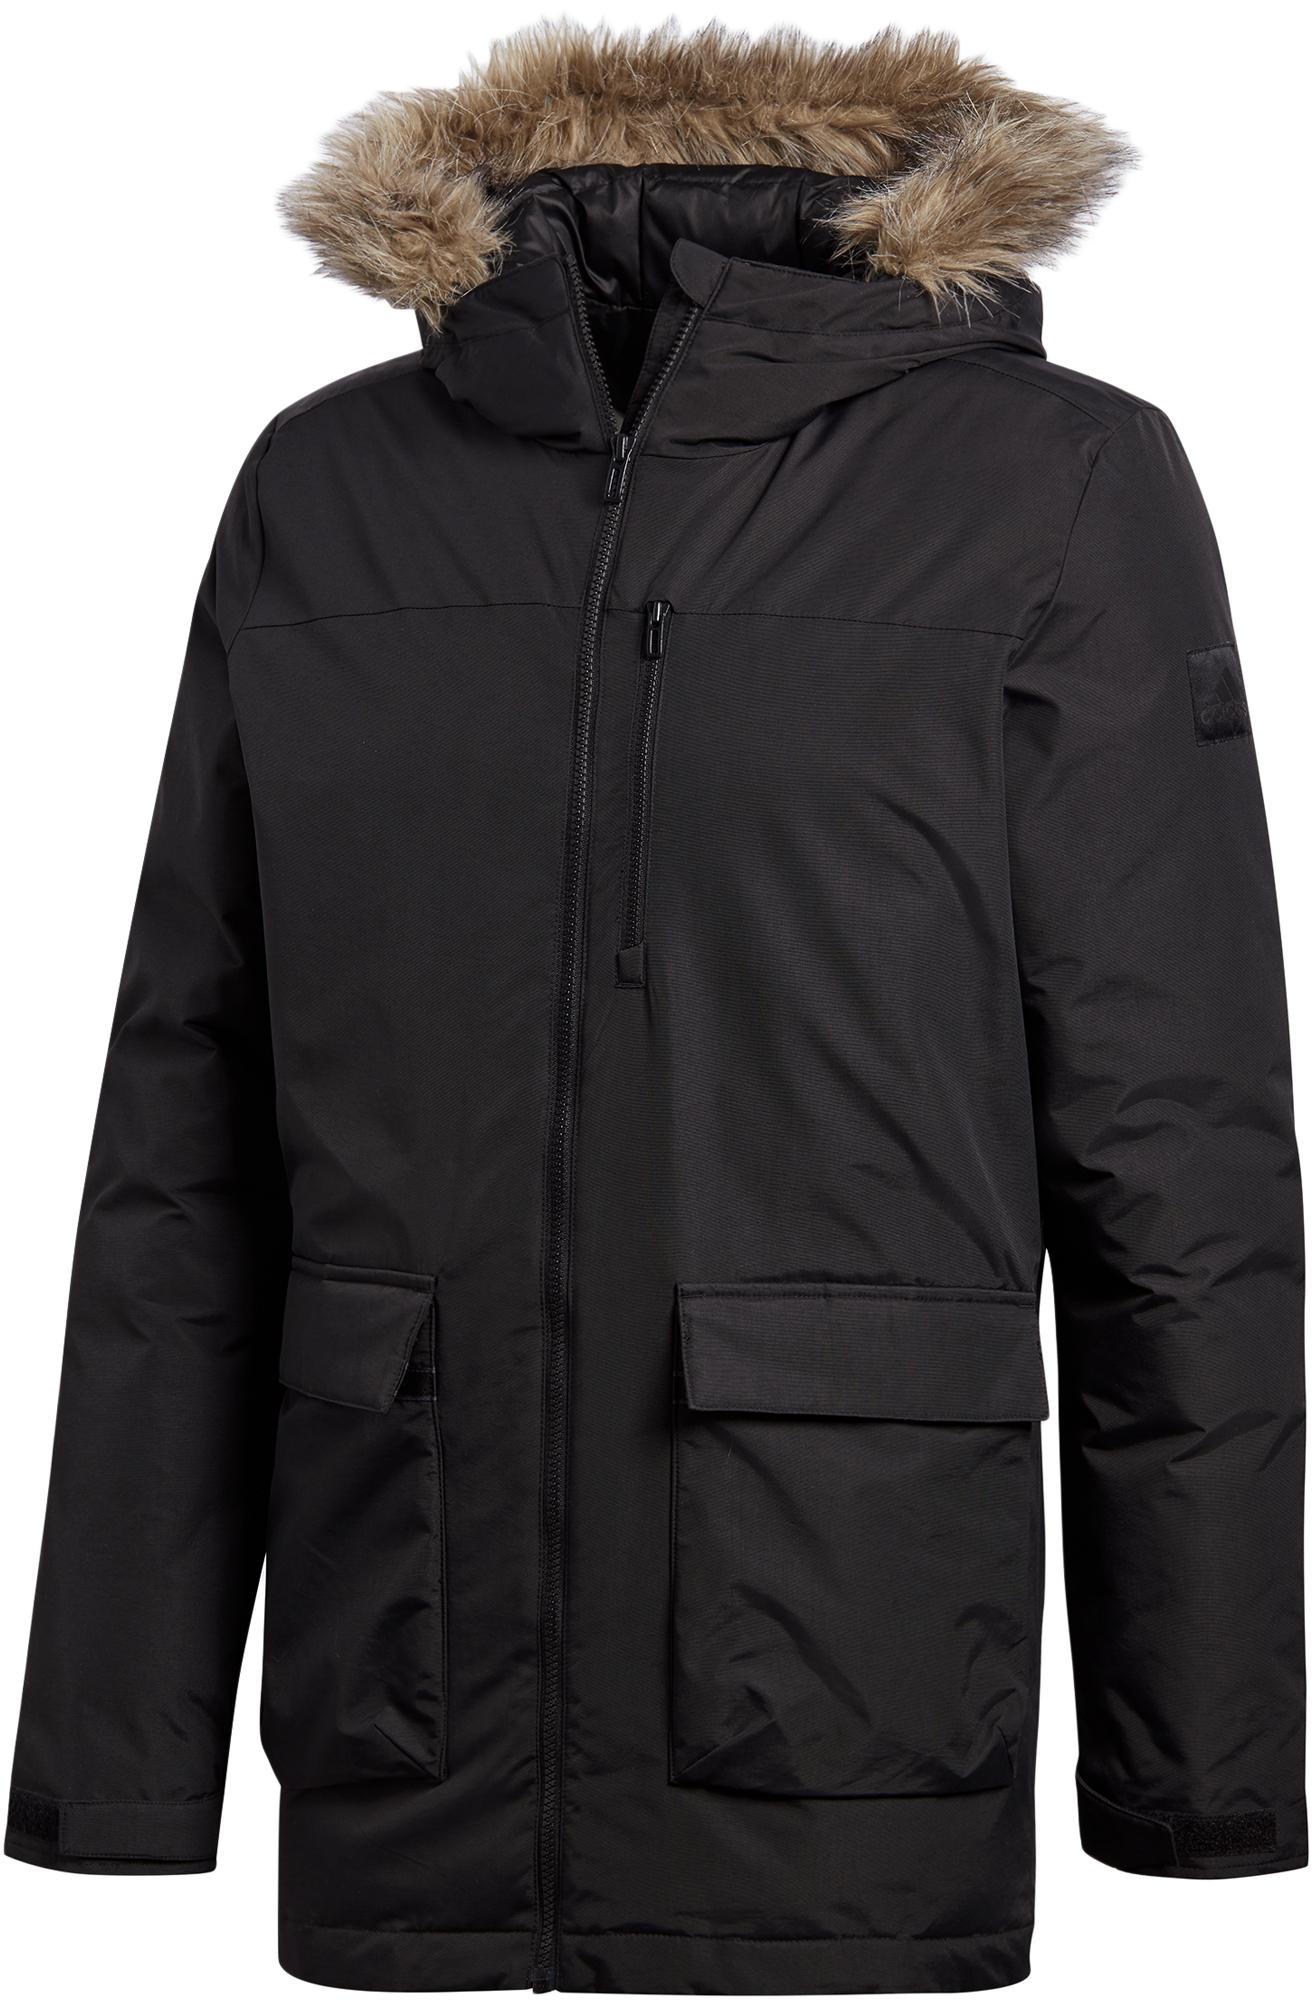 Adidas Куртка утепленная мужская XPLORIC, размер 46